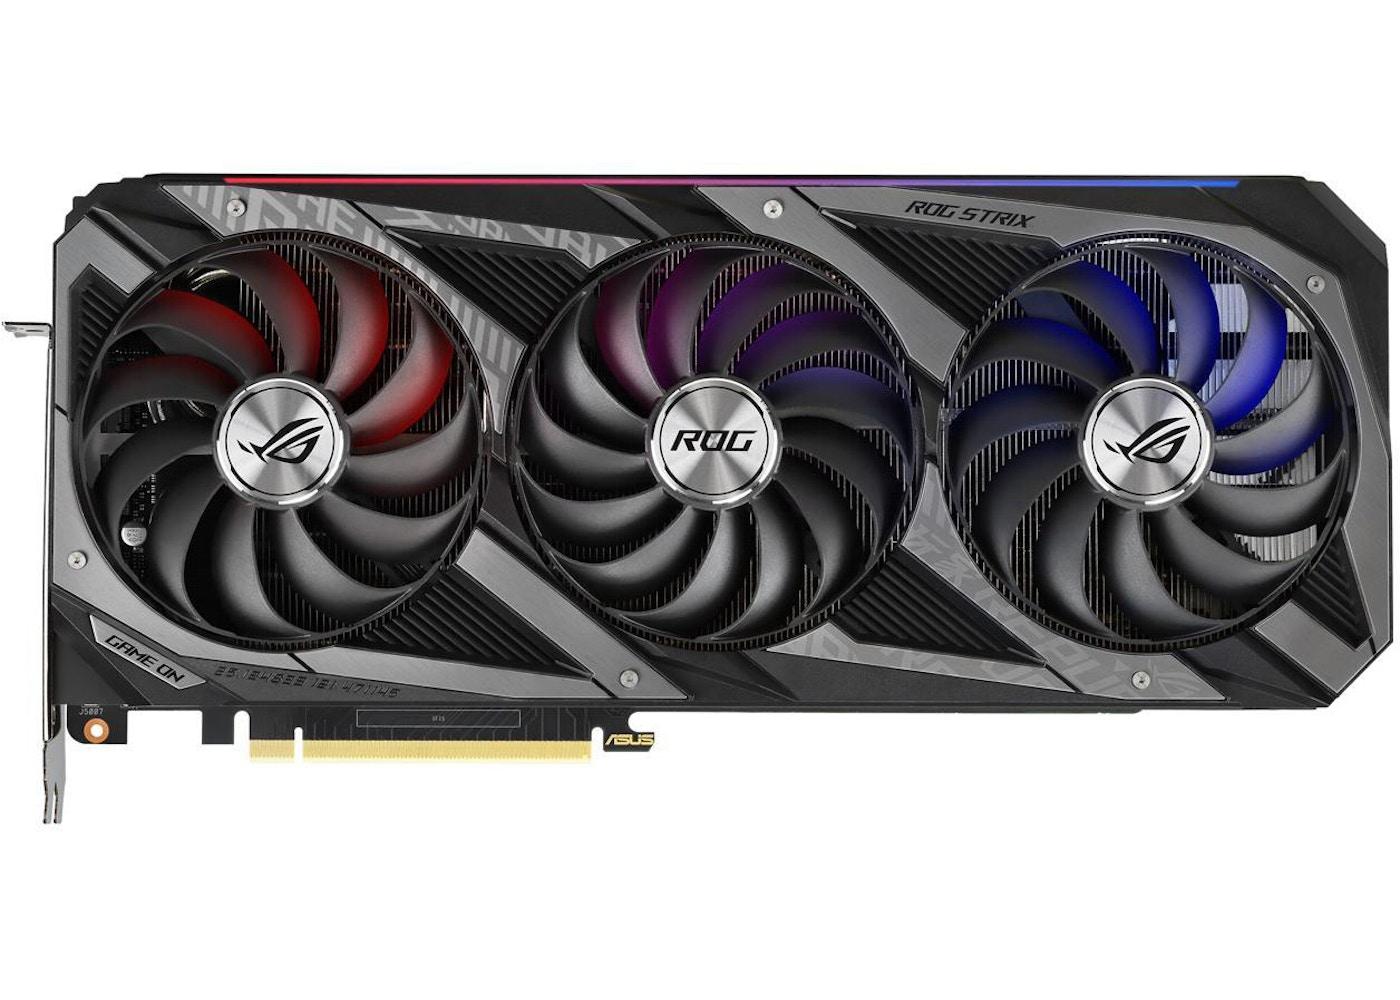 NVIDIA ASUS ROG Stric GeForce RTX 3080 (ROG-STRIX-RTX3080-10G-GAMING)